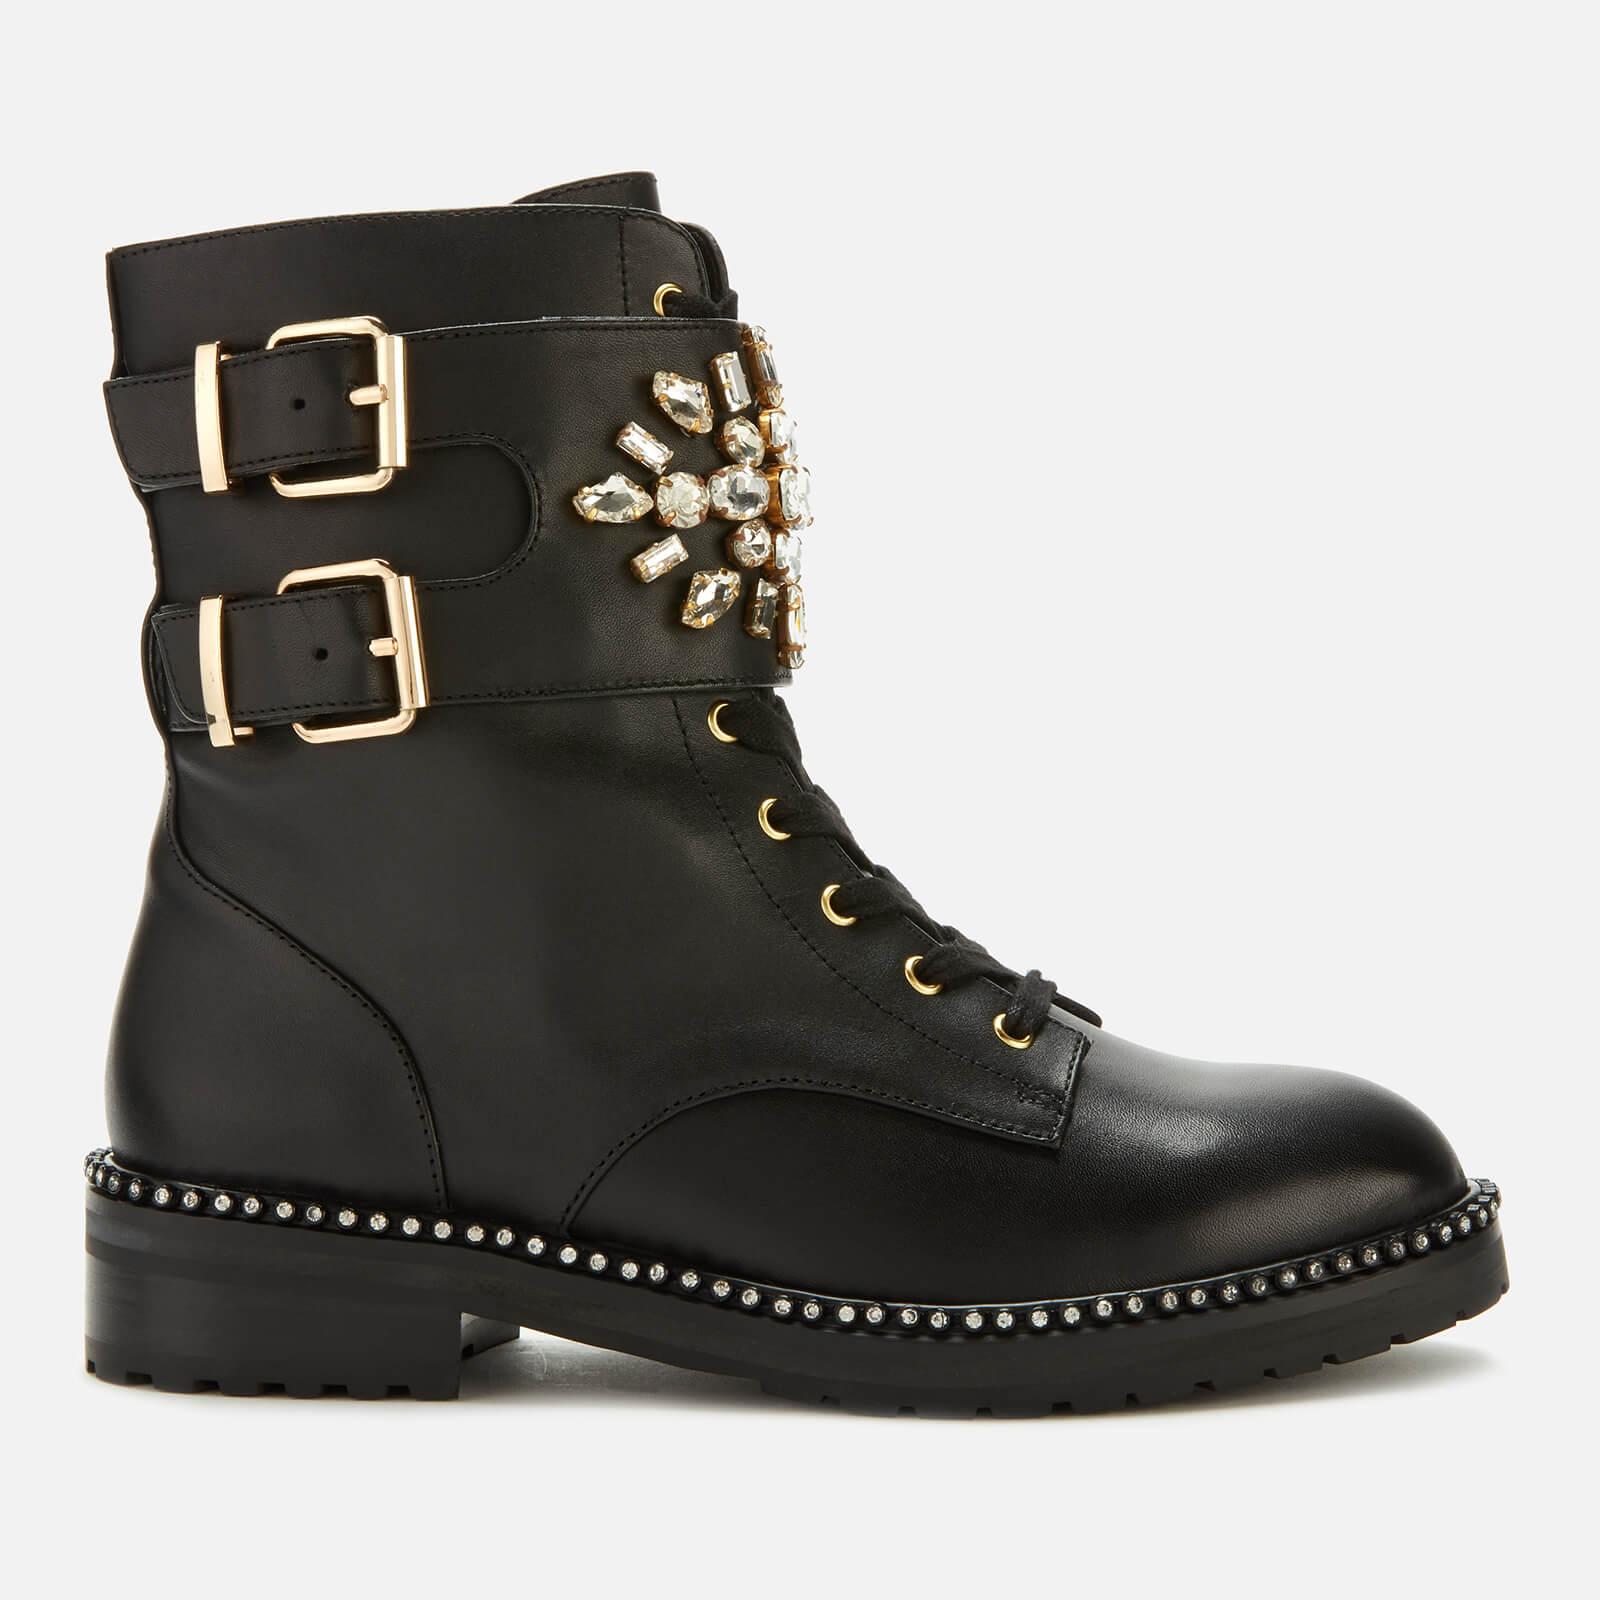 Kurt Geiger London Women's Stoop Leather Lace Up Boots - Black - UK 8